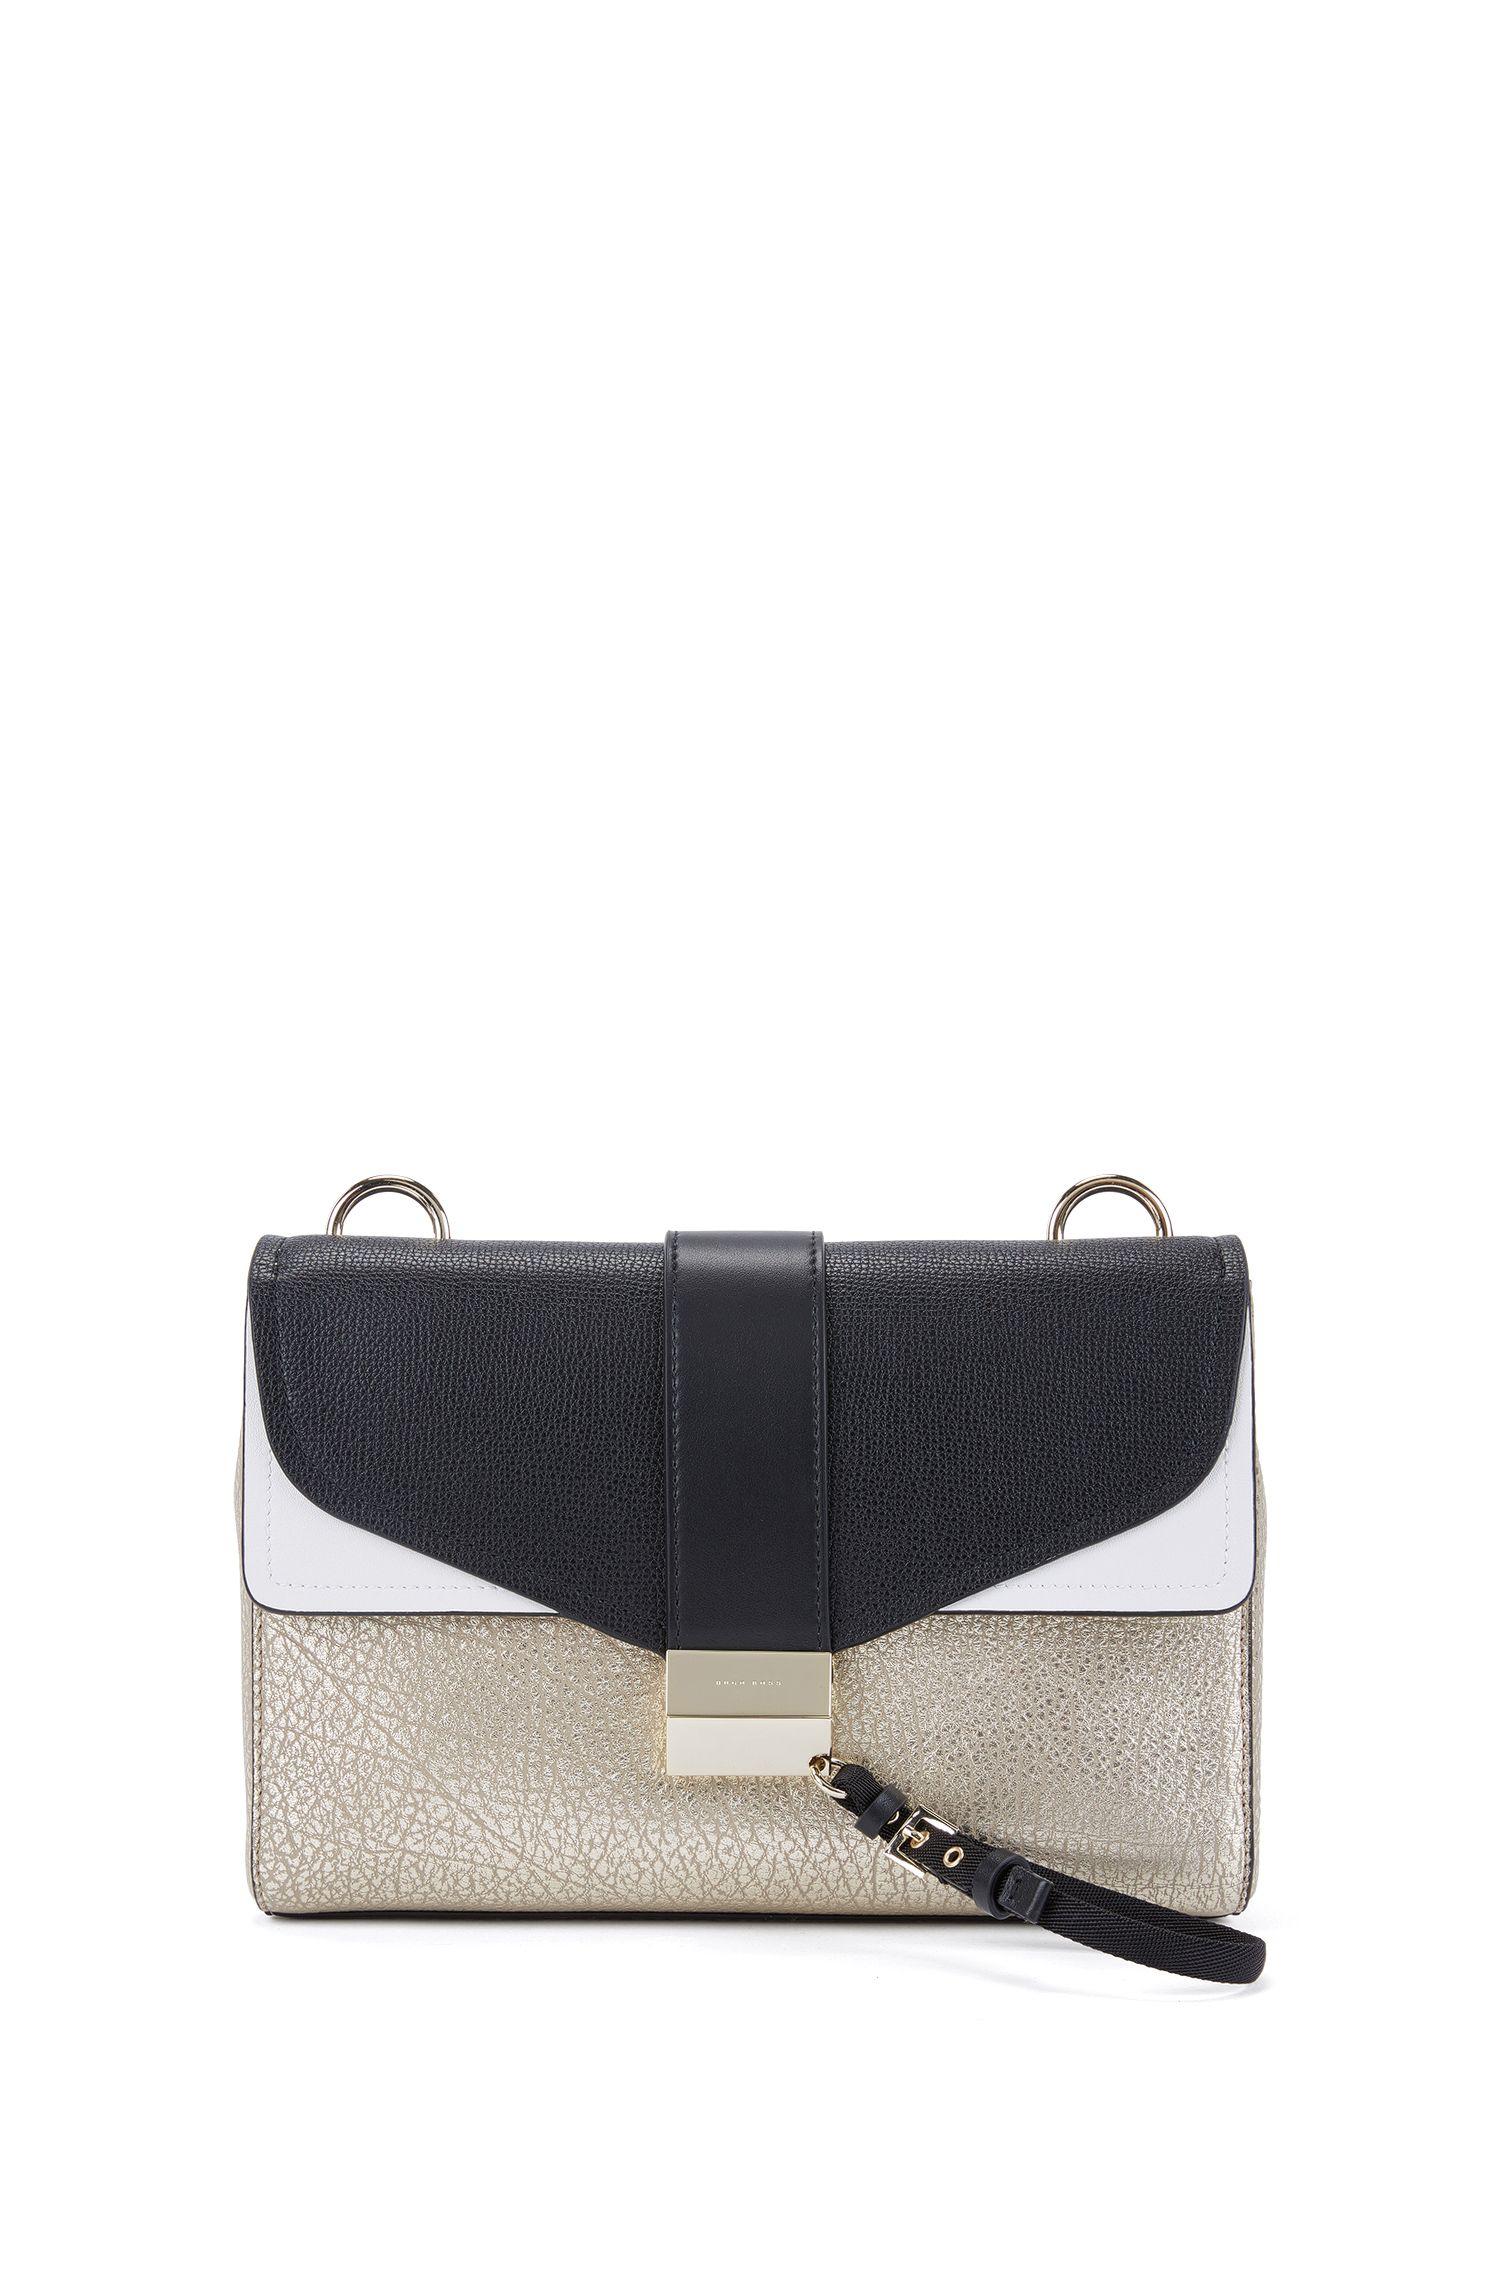 Shoulder bag in Italian leather